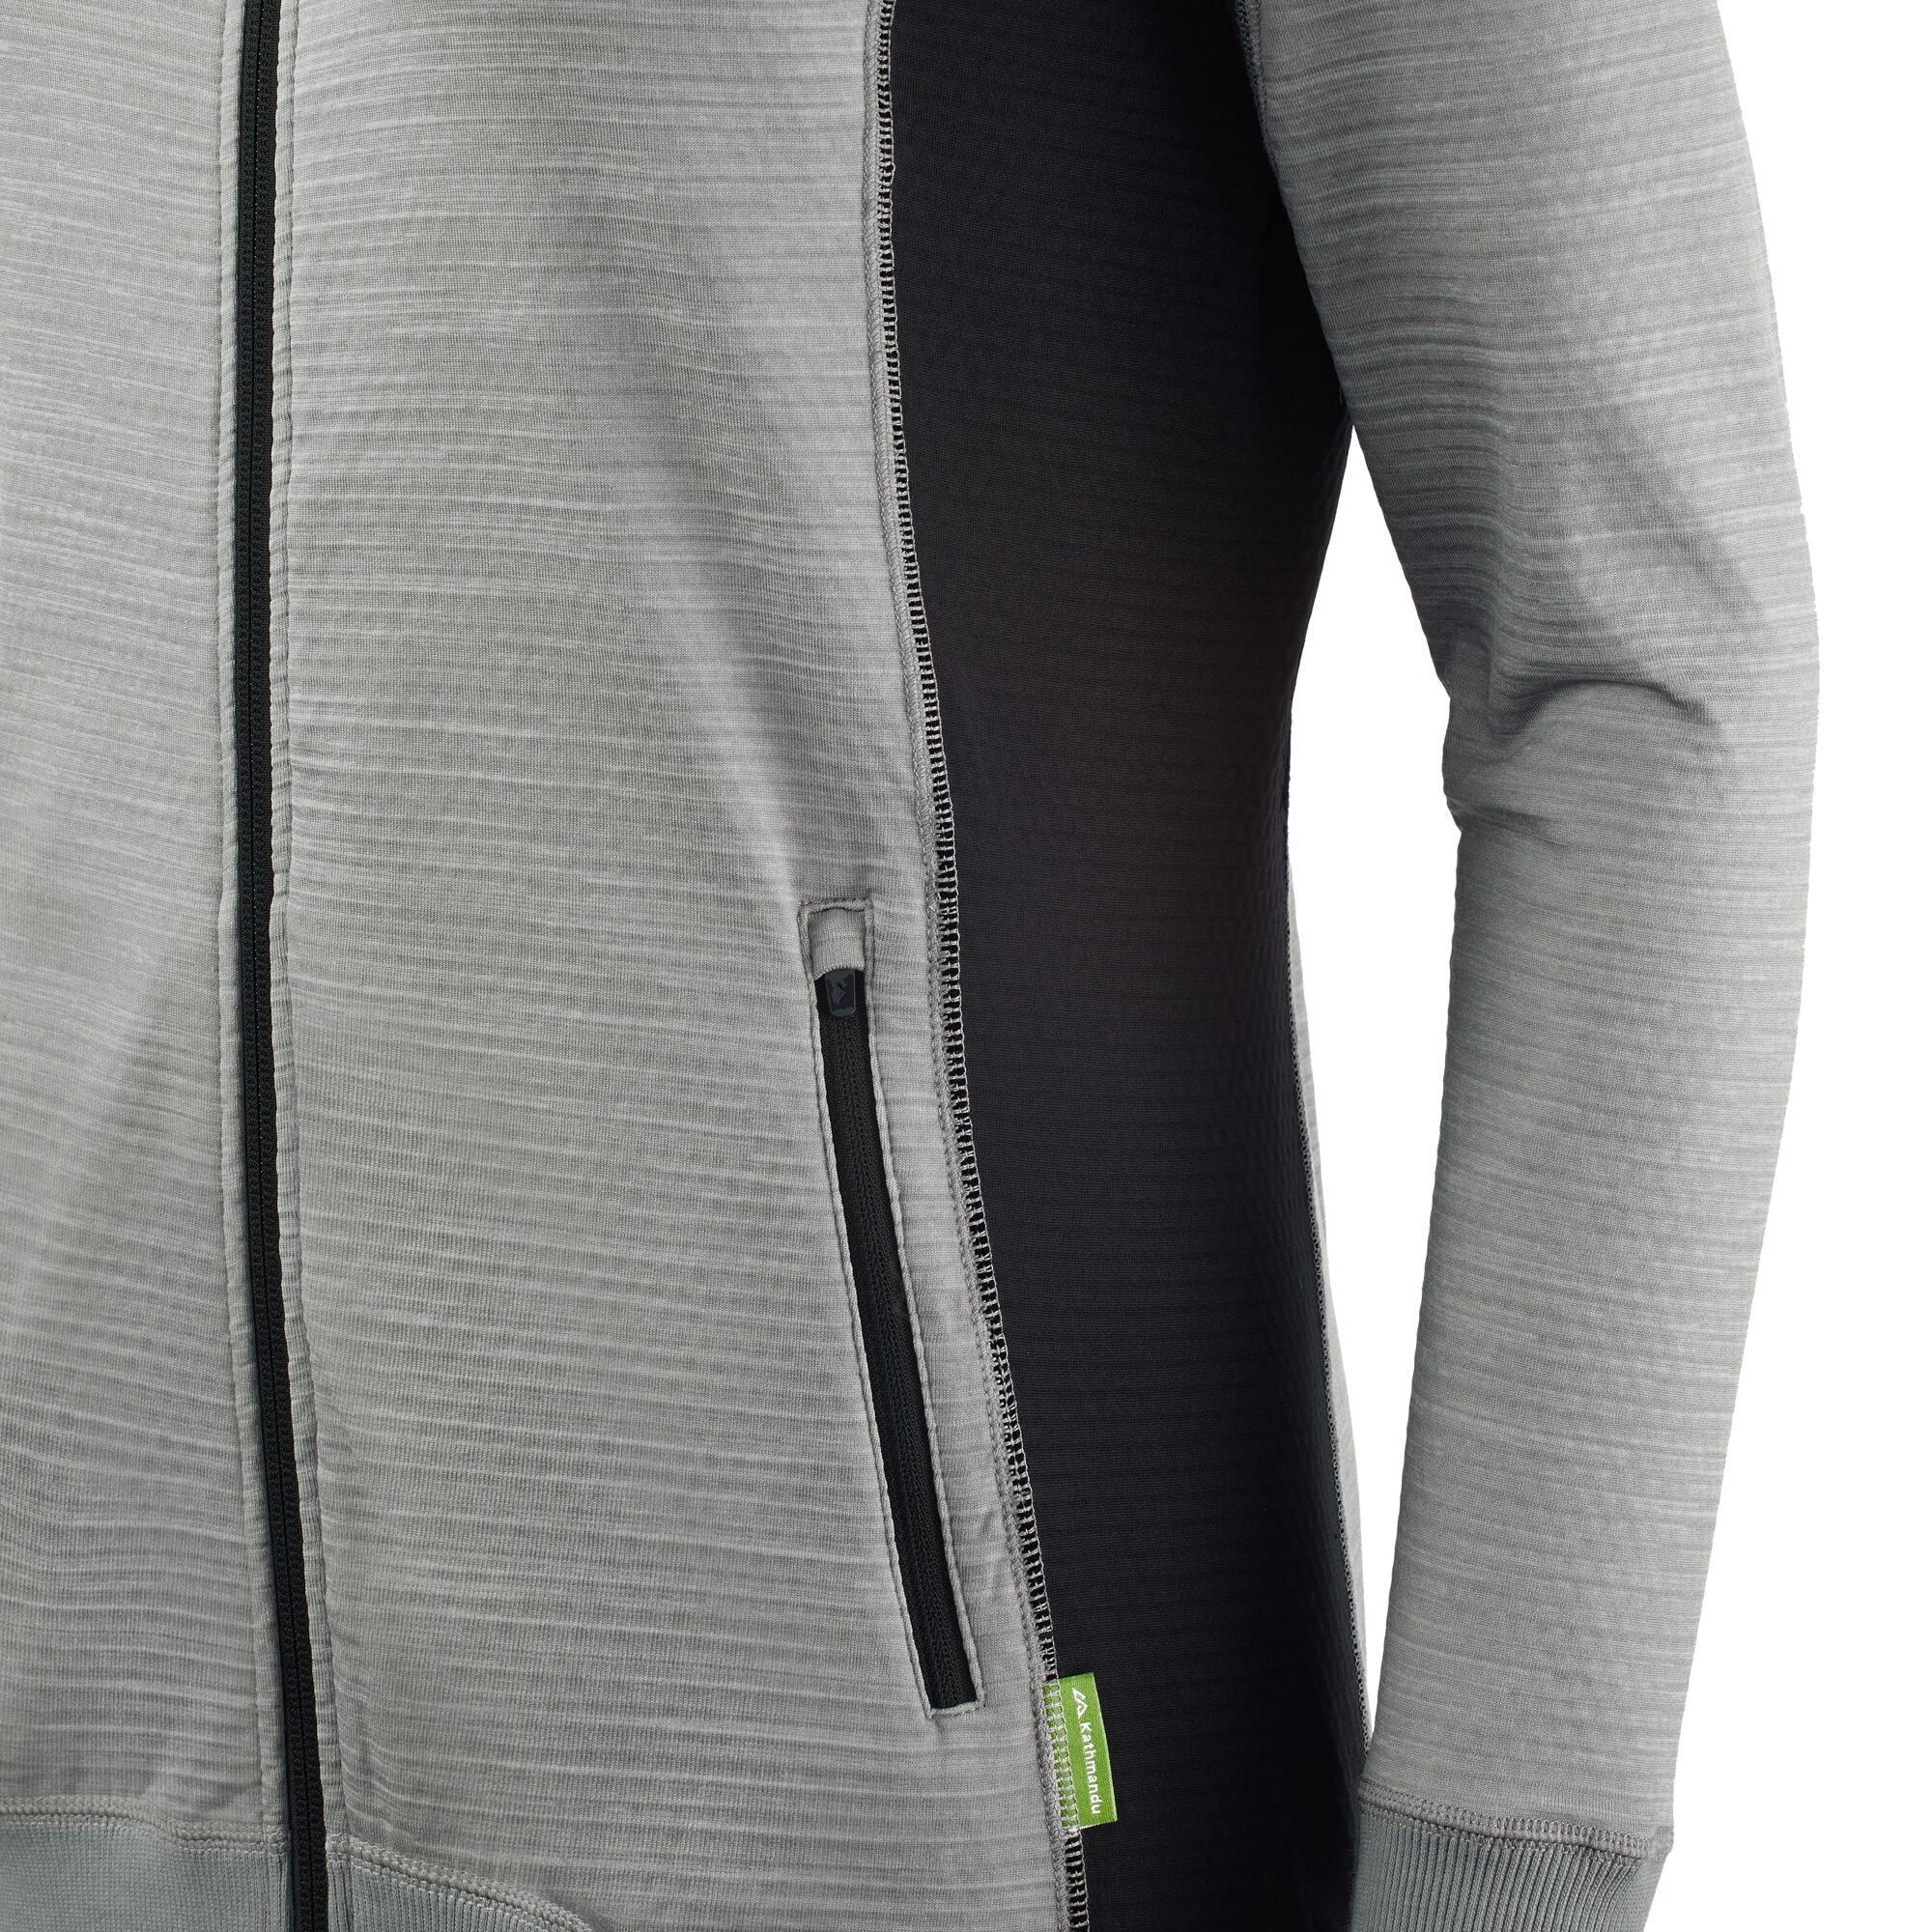 NEW-Kathmandu-Acota-Women-s-Hooded-Fleece-Lightweight-Breathable-Outdoor-Jacket thumbnail 28